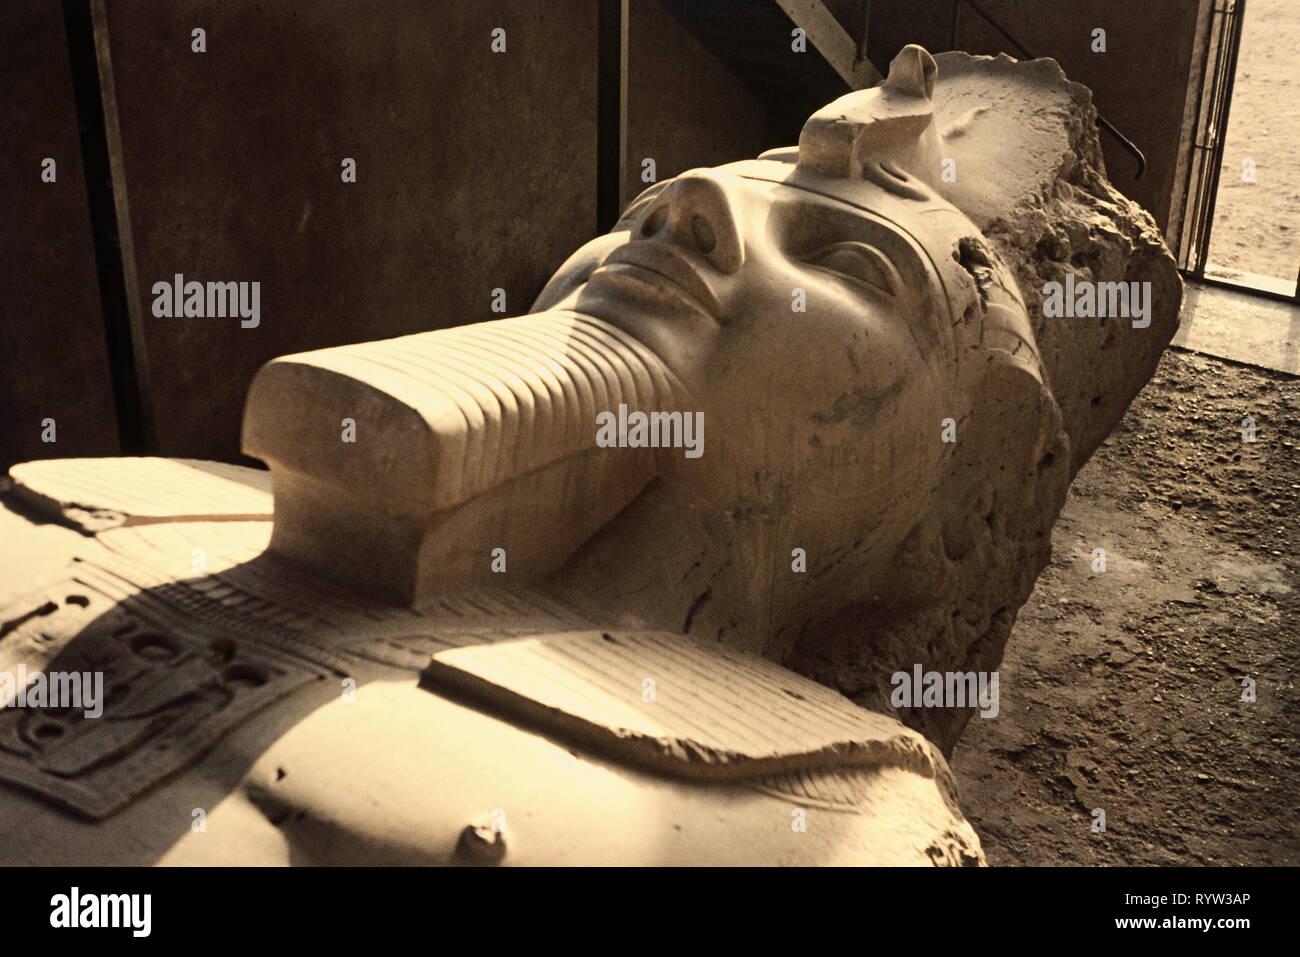 Geographie/Reisen, Ägypten, Memphis, Statue von Ramses II., Detail, Additional-Rights - Clearance-Info - Not-Available Stockbild